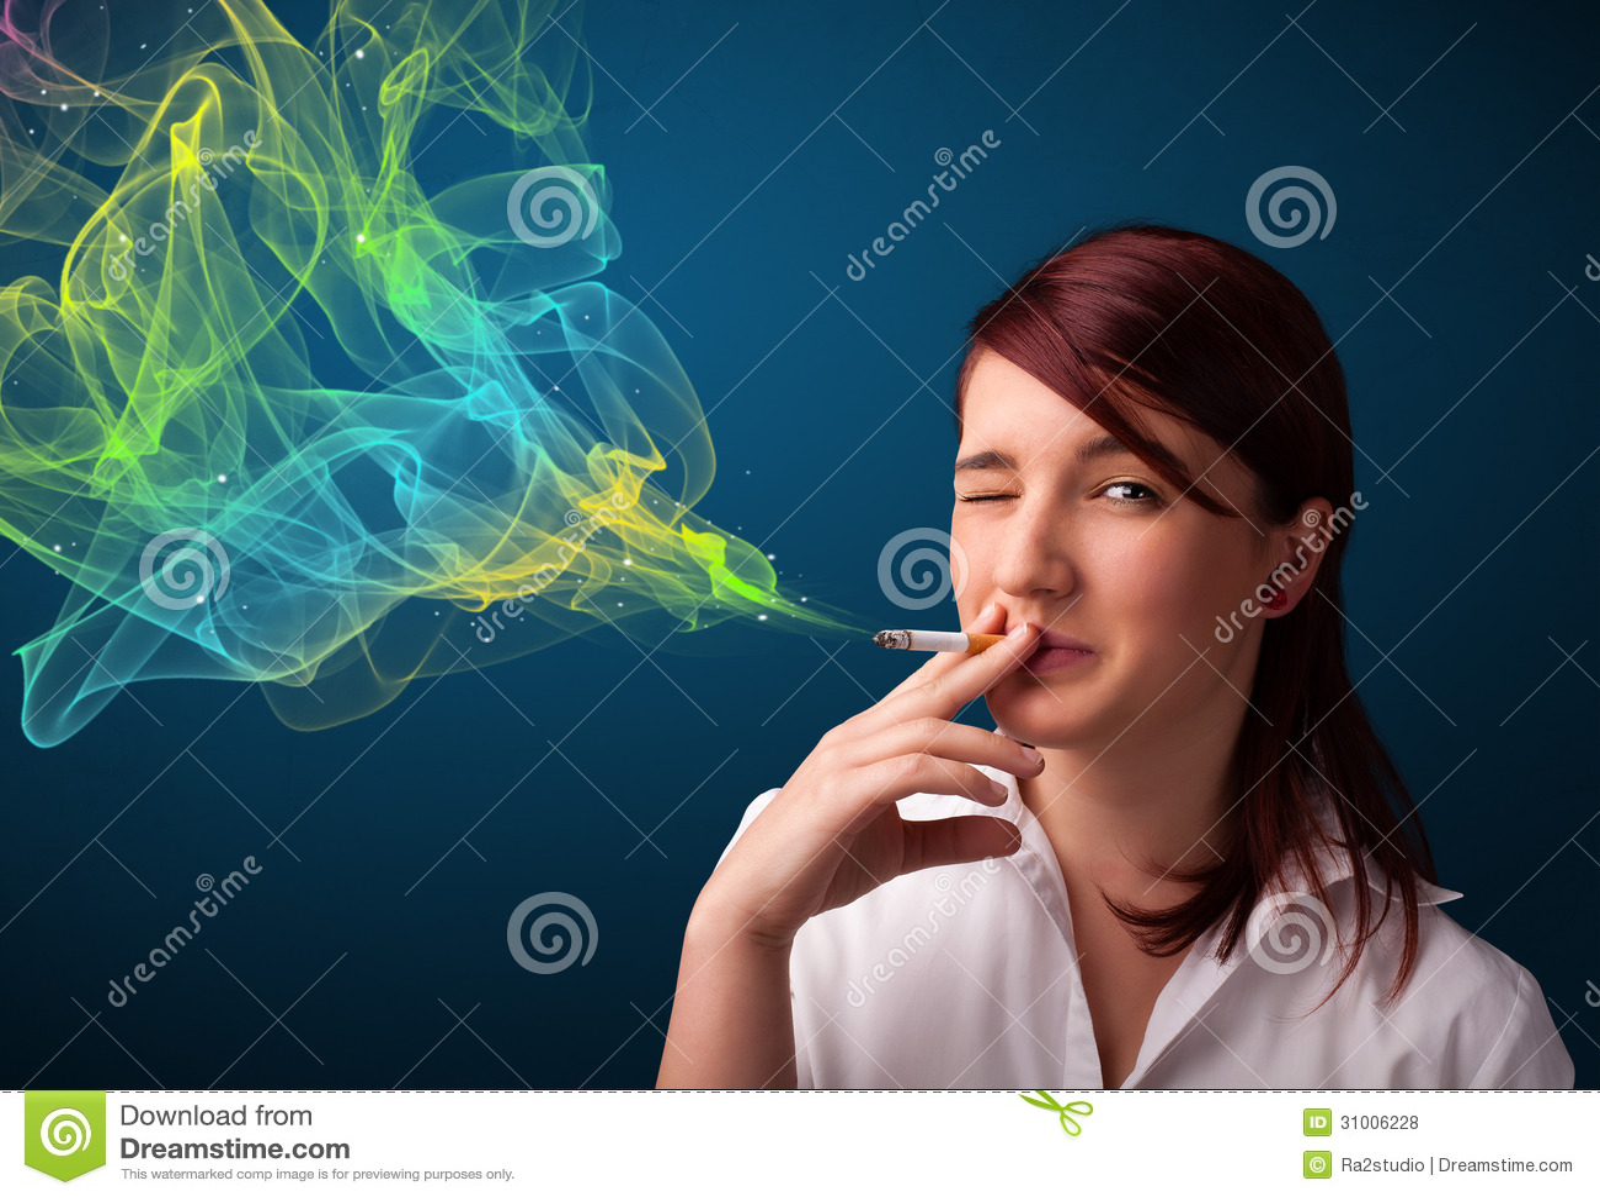 Pretty Lady Smoking Cigarette With Colorful Smoke Royalty